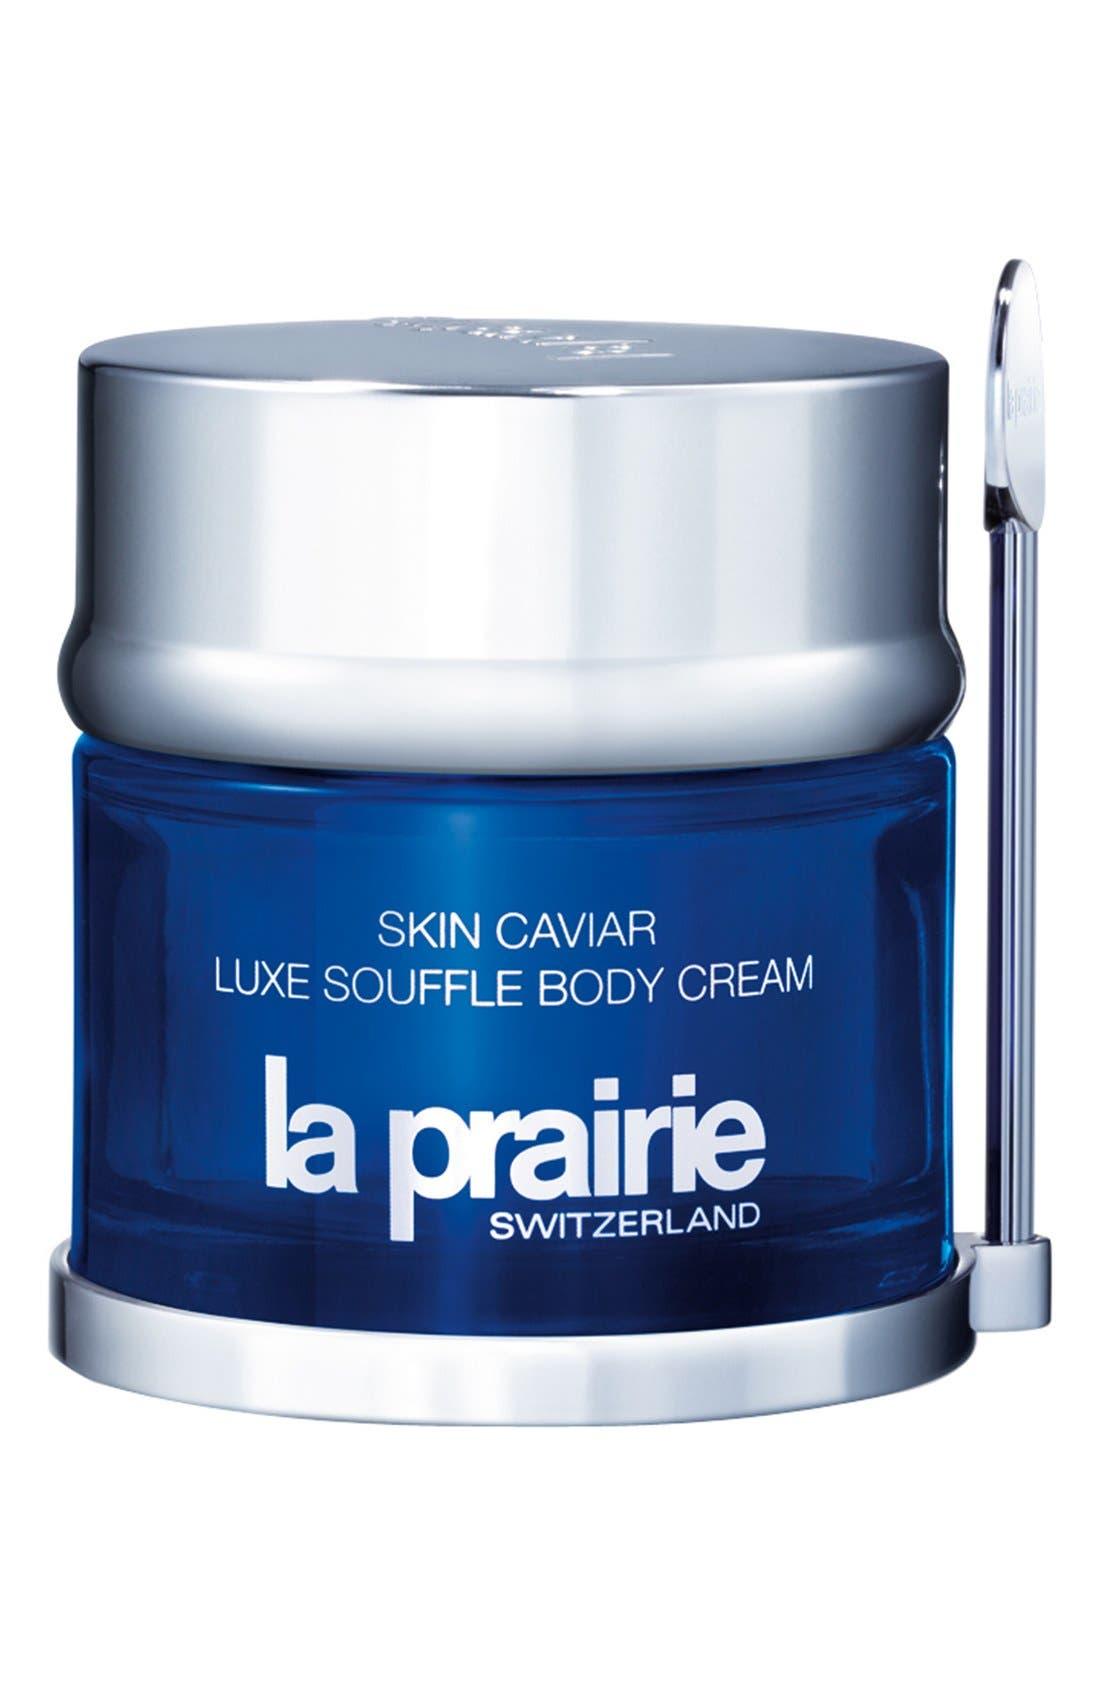 Skin Caviar Luxe Soufflé Body Cream,                         Main,                         color, NO COLOR